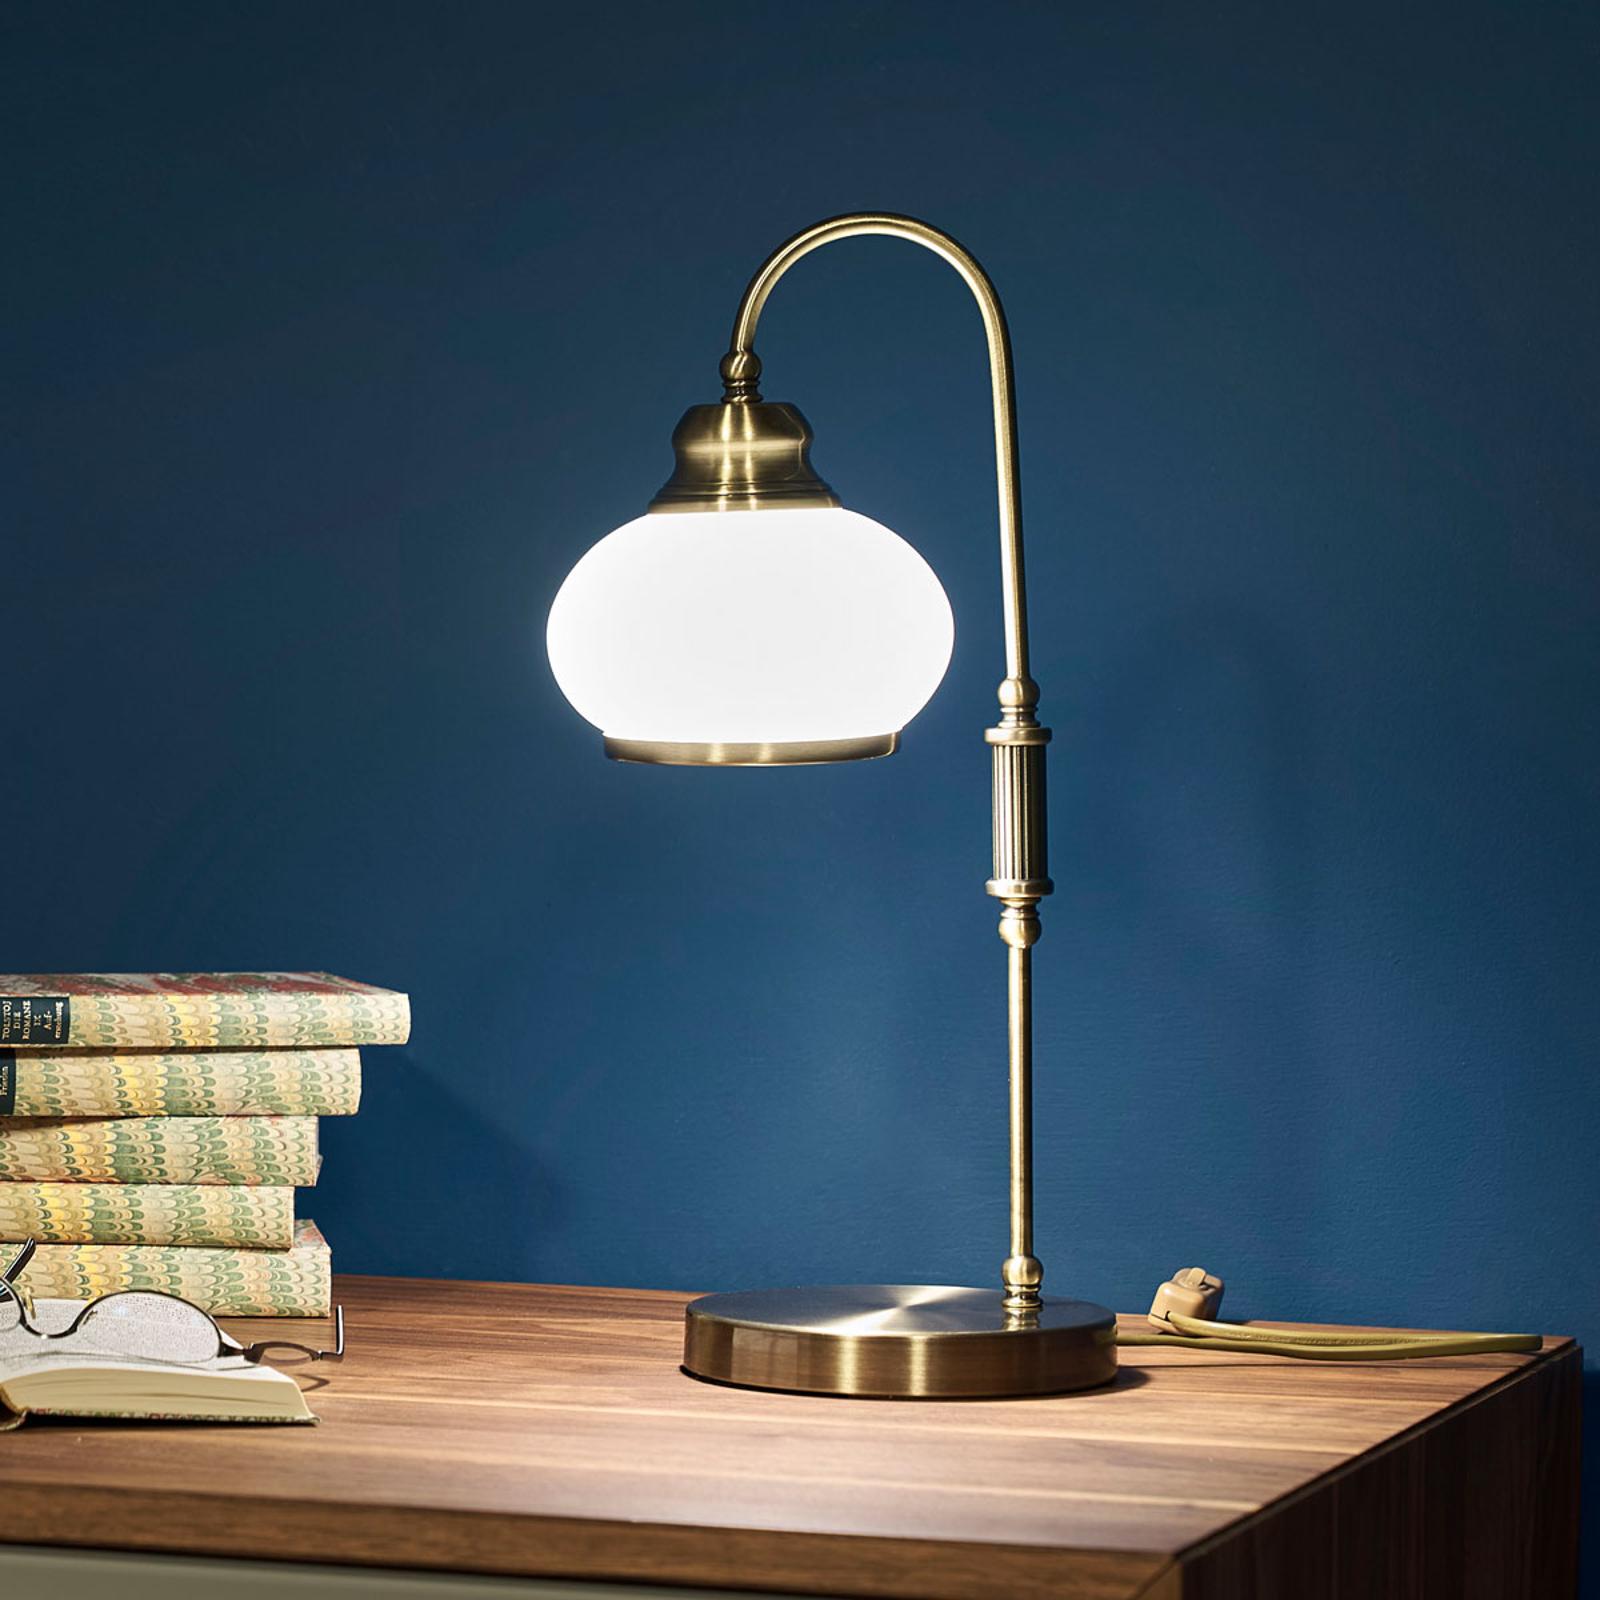 Tafellamp NOSTALGIKA, oud-messing